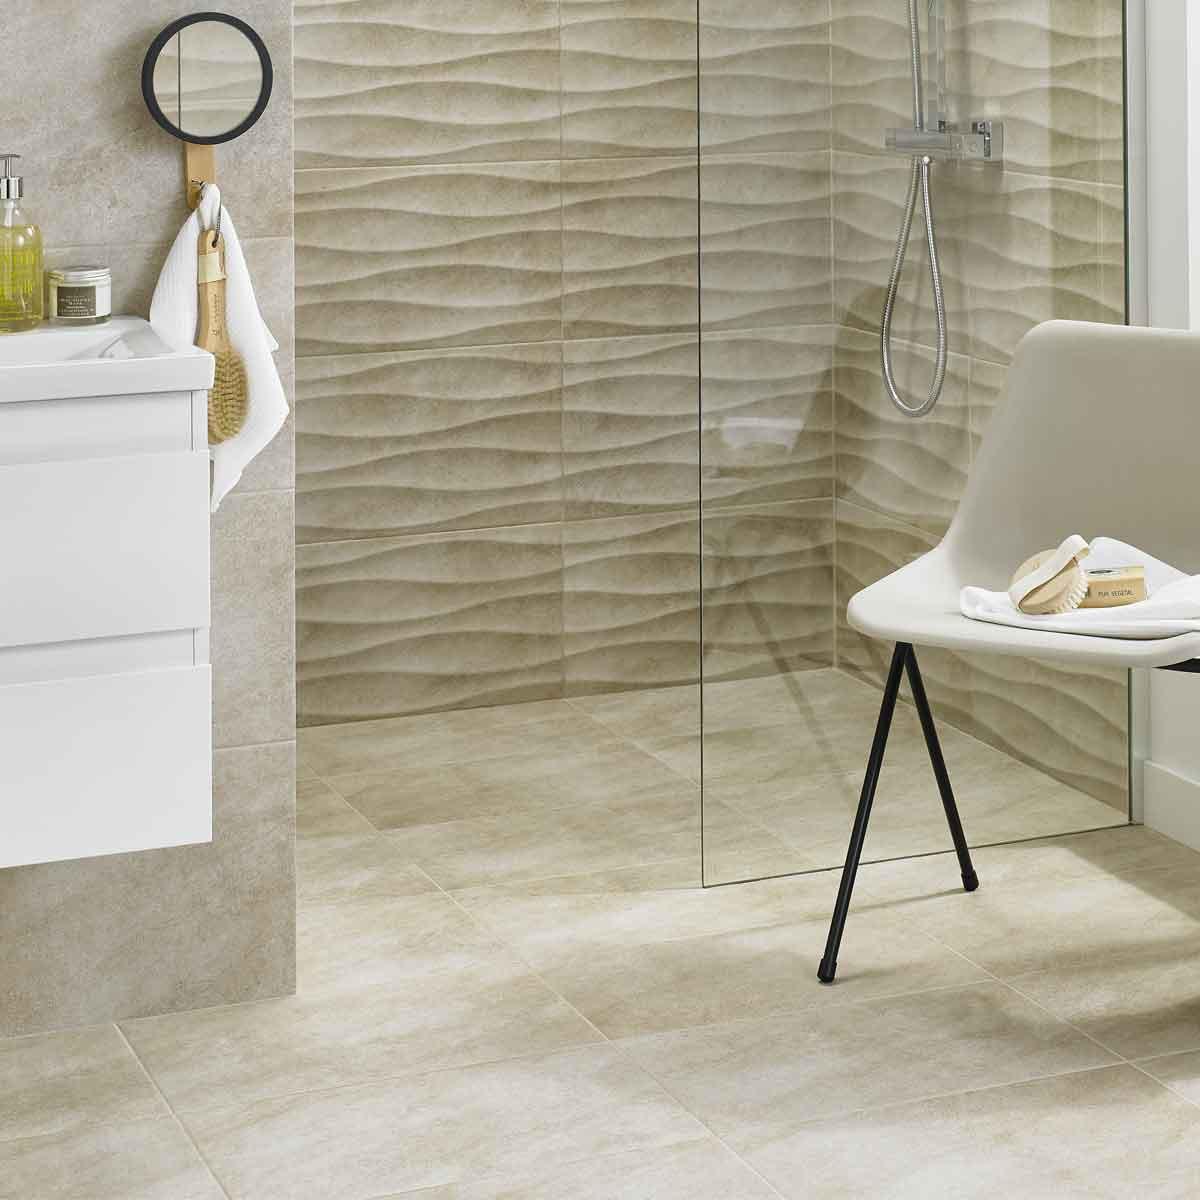 Floor tiles for kitchen bathroom british ceramic tile oak matt wall floor dailygadgetfo Choice Image